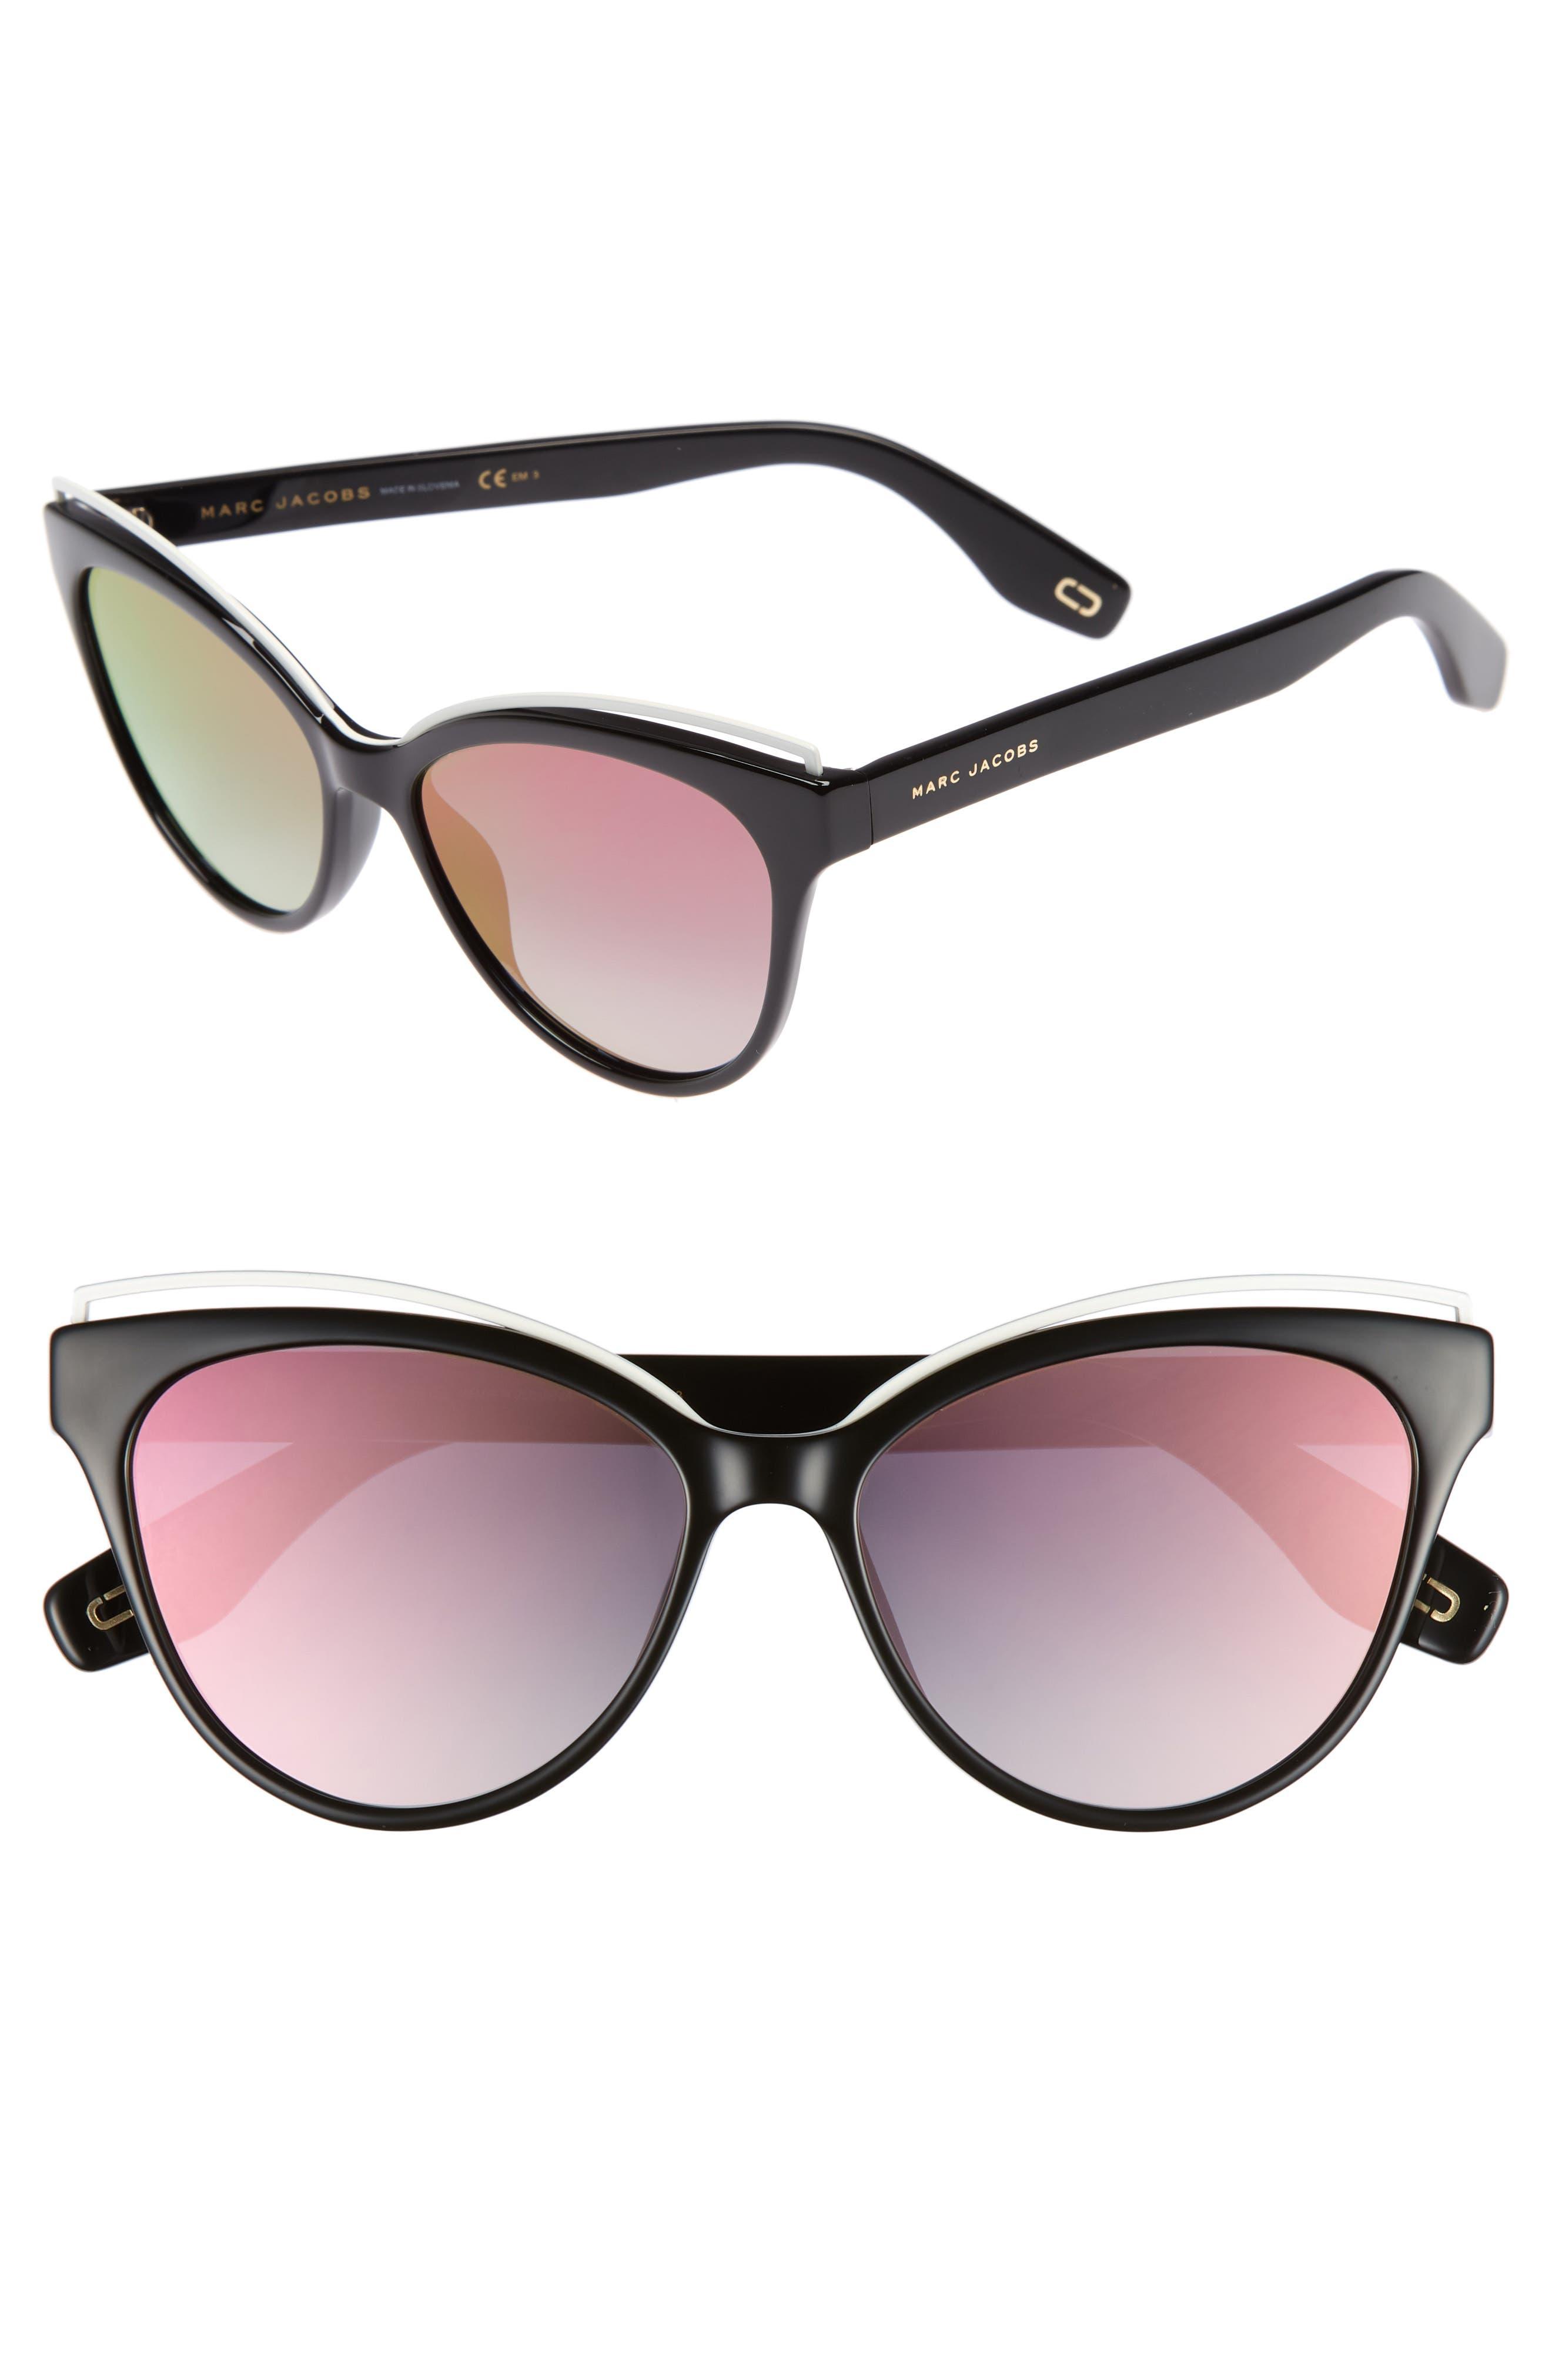 55mm Cat Eye Sunglasses,                             Main thumbnail 1, color,                             Black/ Pink